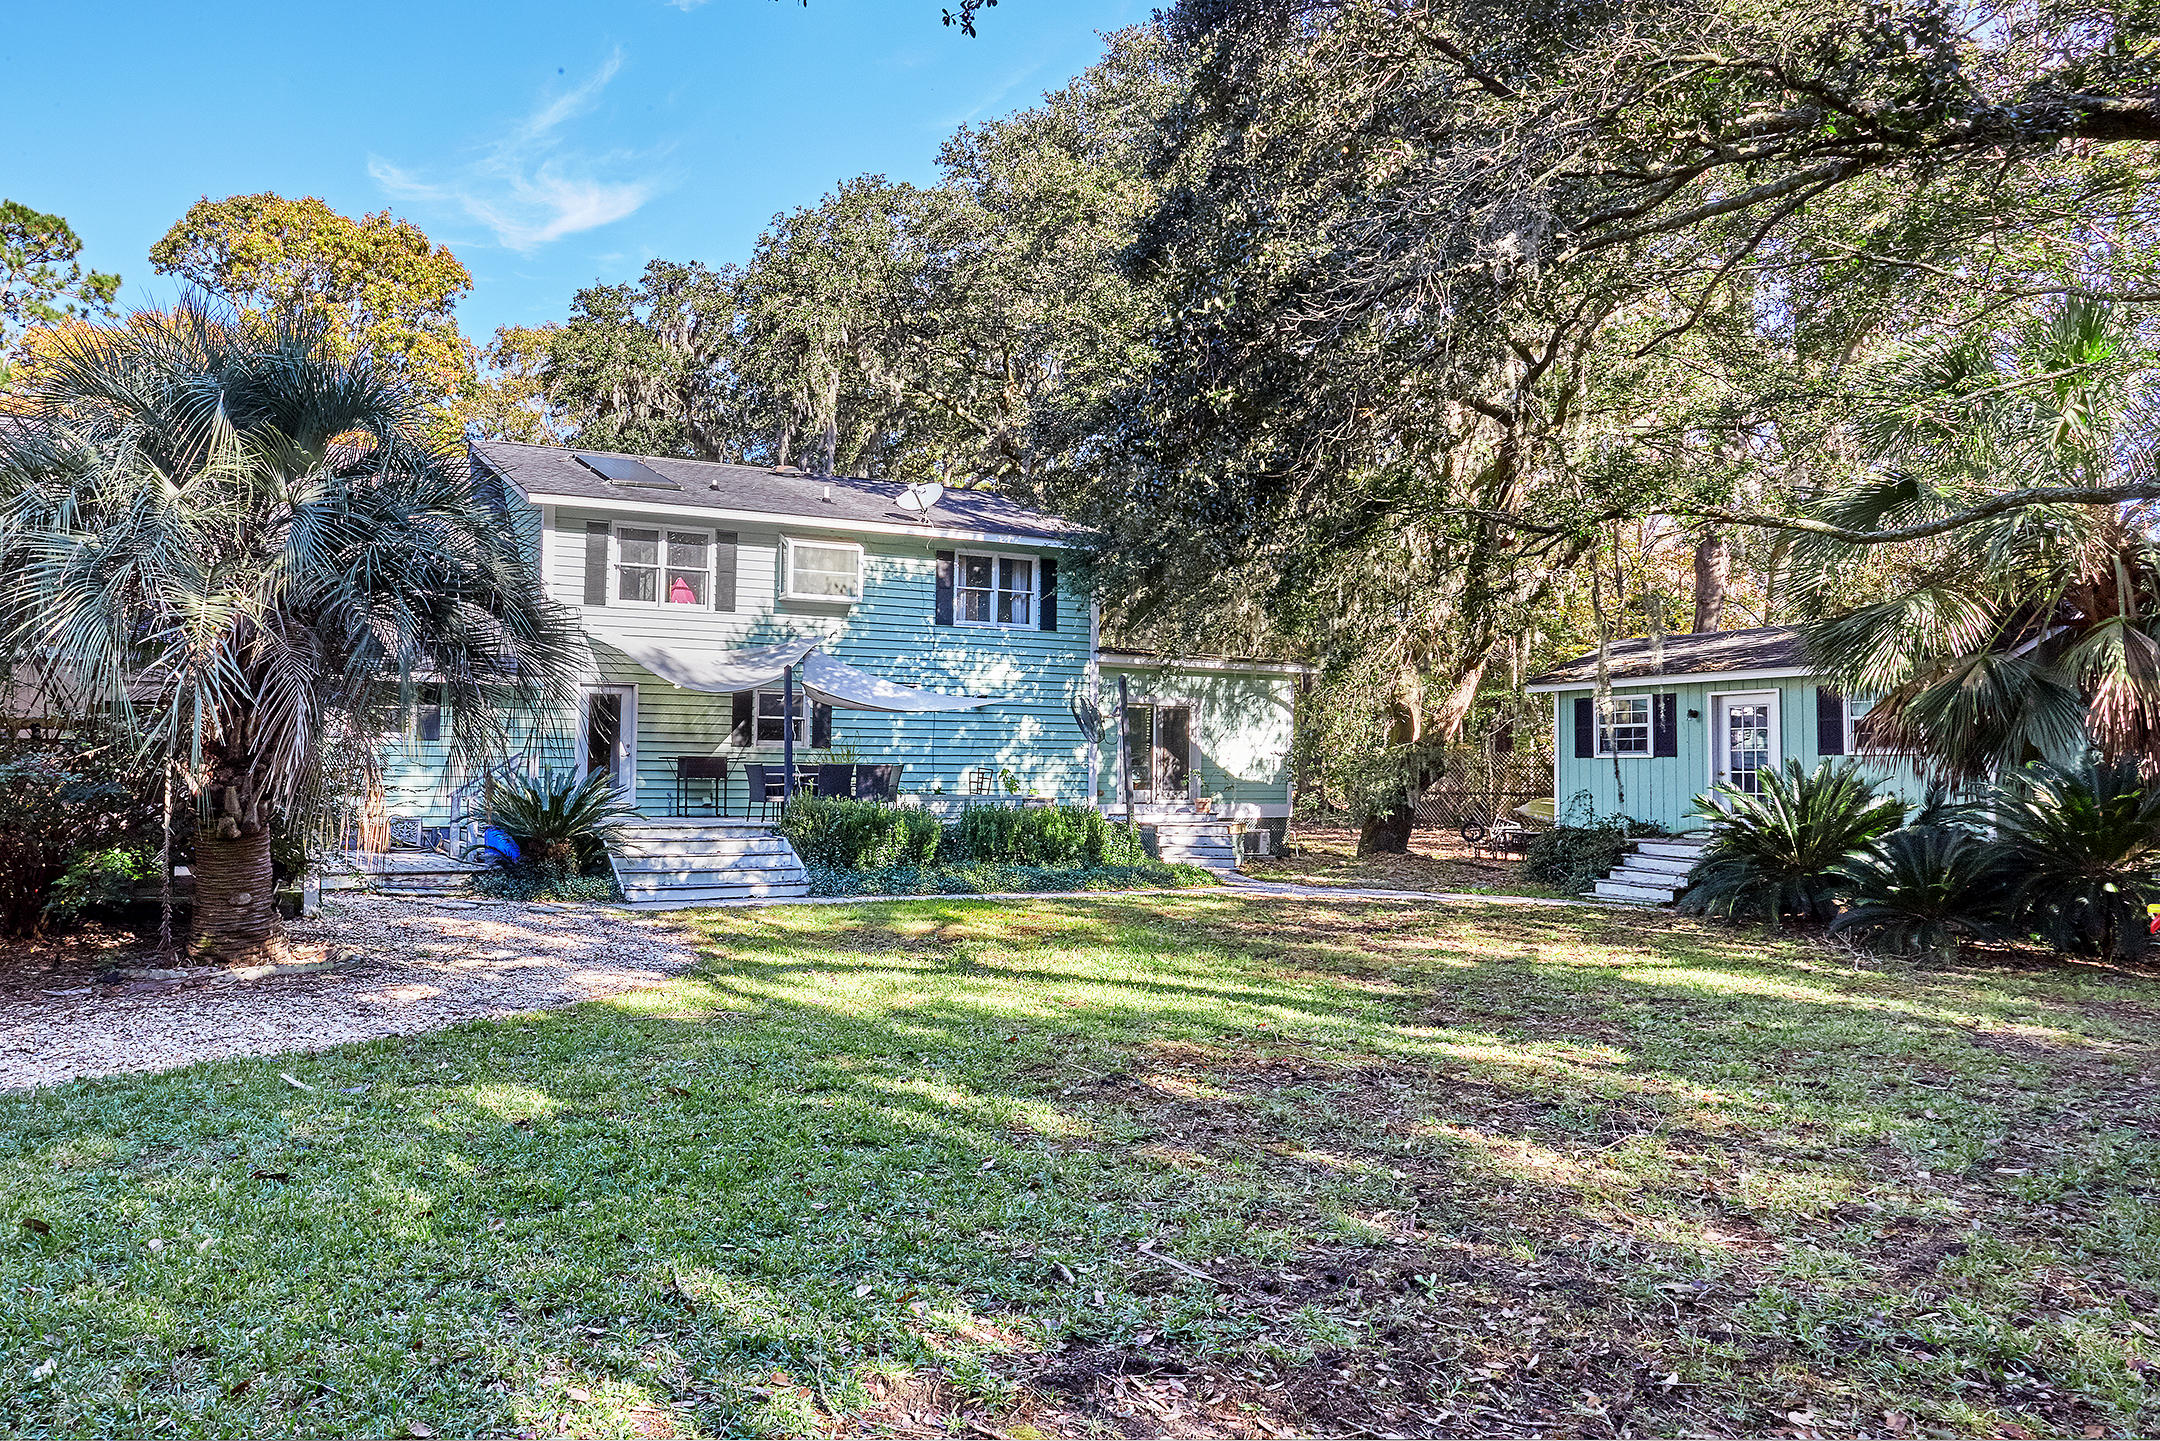 Shoreline Farms Homes For Sale - 2663 Starfish, Johns Island, SC - 2